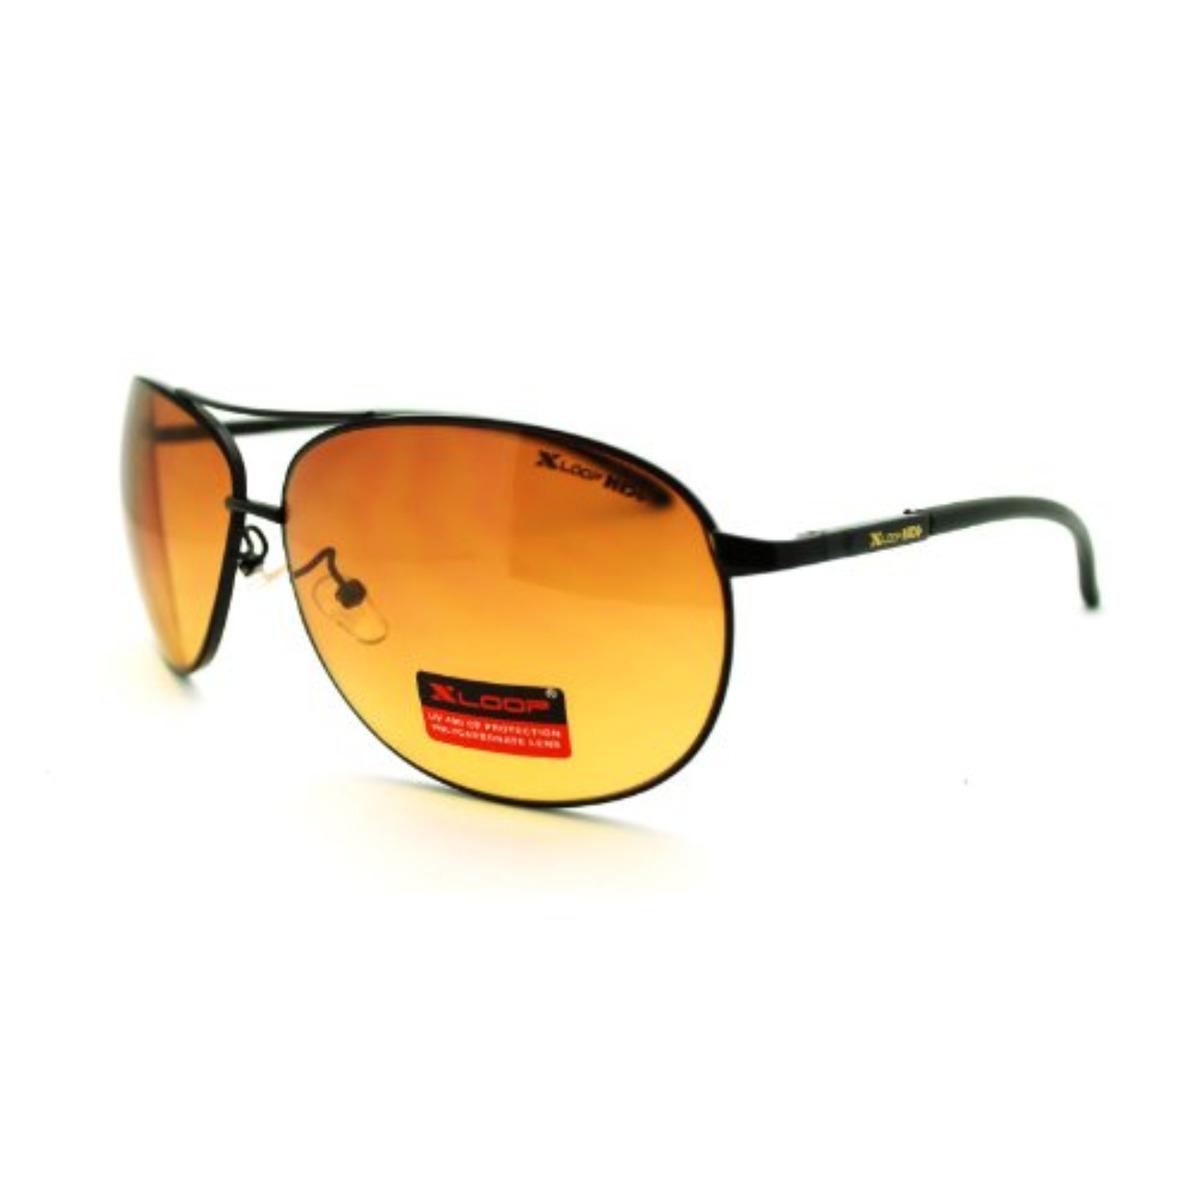 21c7c12c0eb HD Vision Ultra Sunglasses V0846